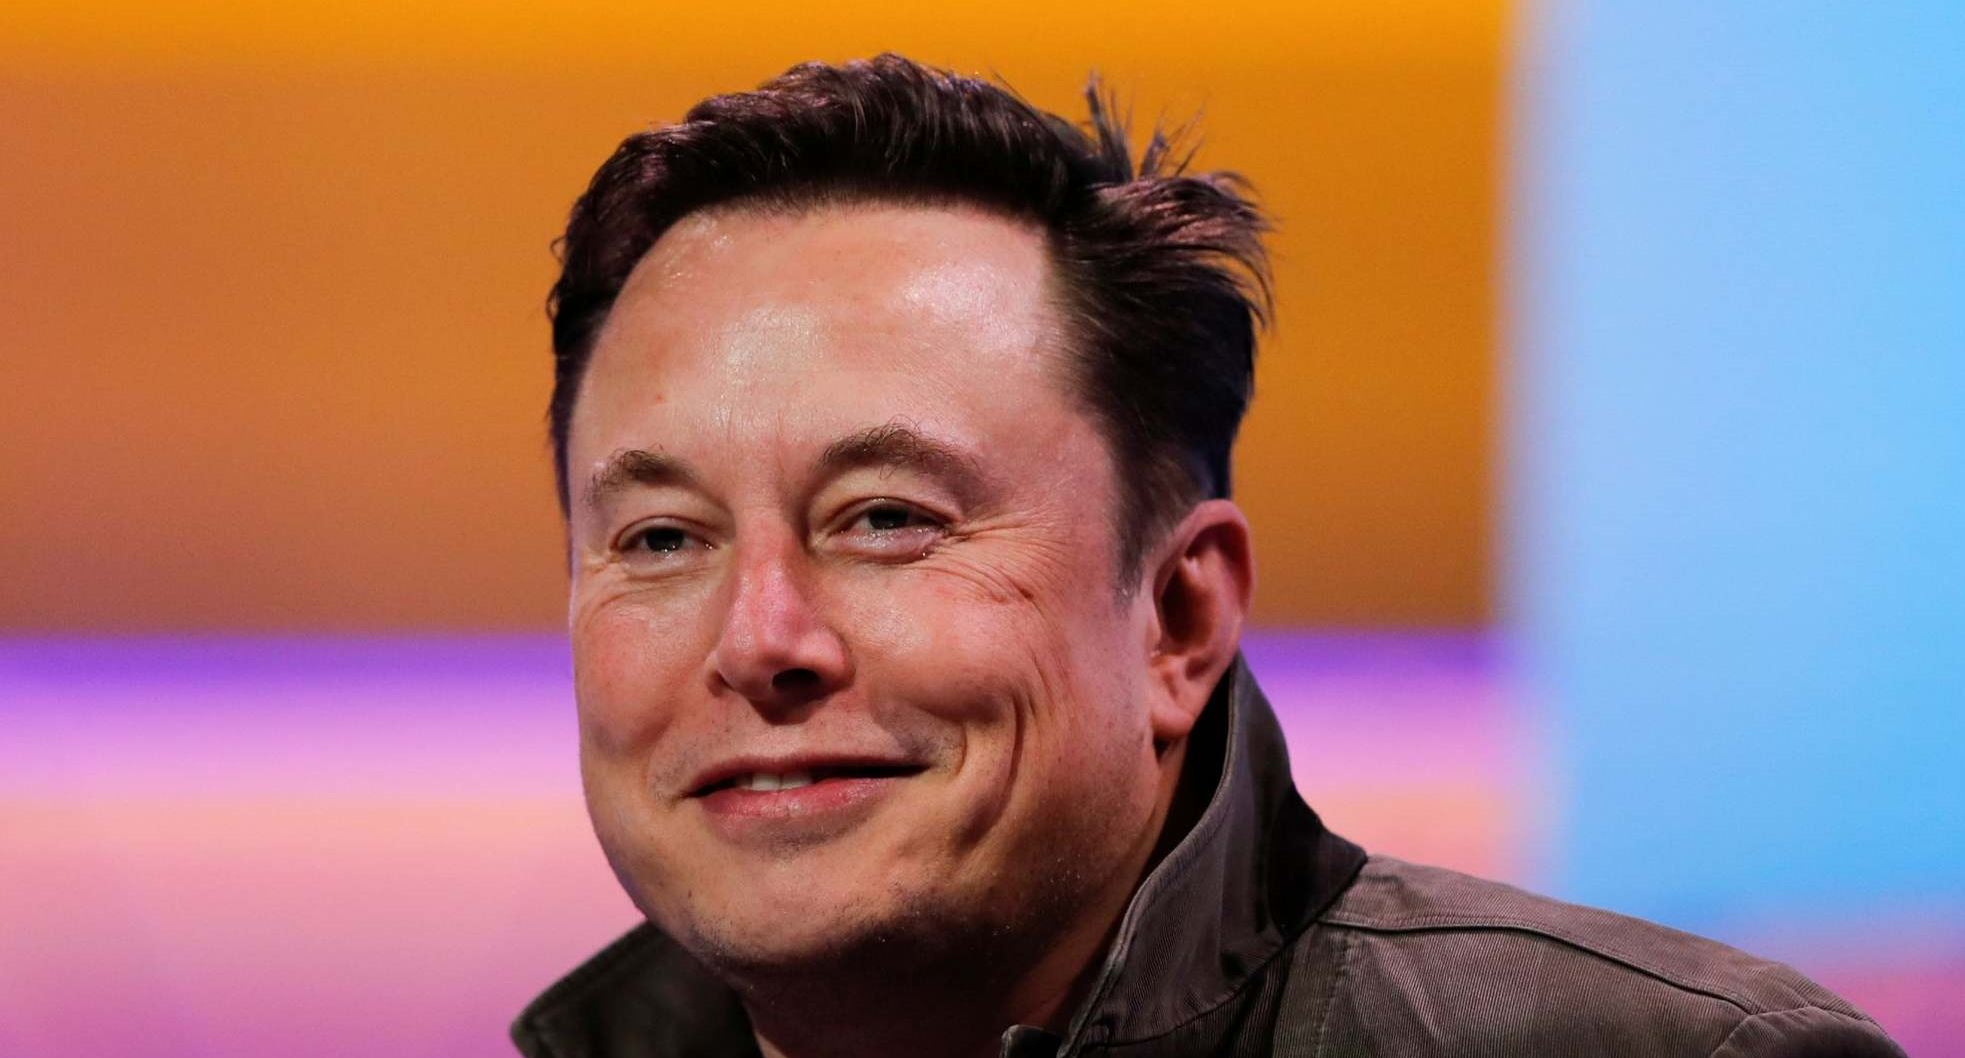 Elon Musk's Tesla stocks overtake Facebook, now worth $834 billion